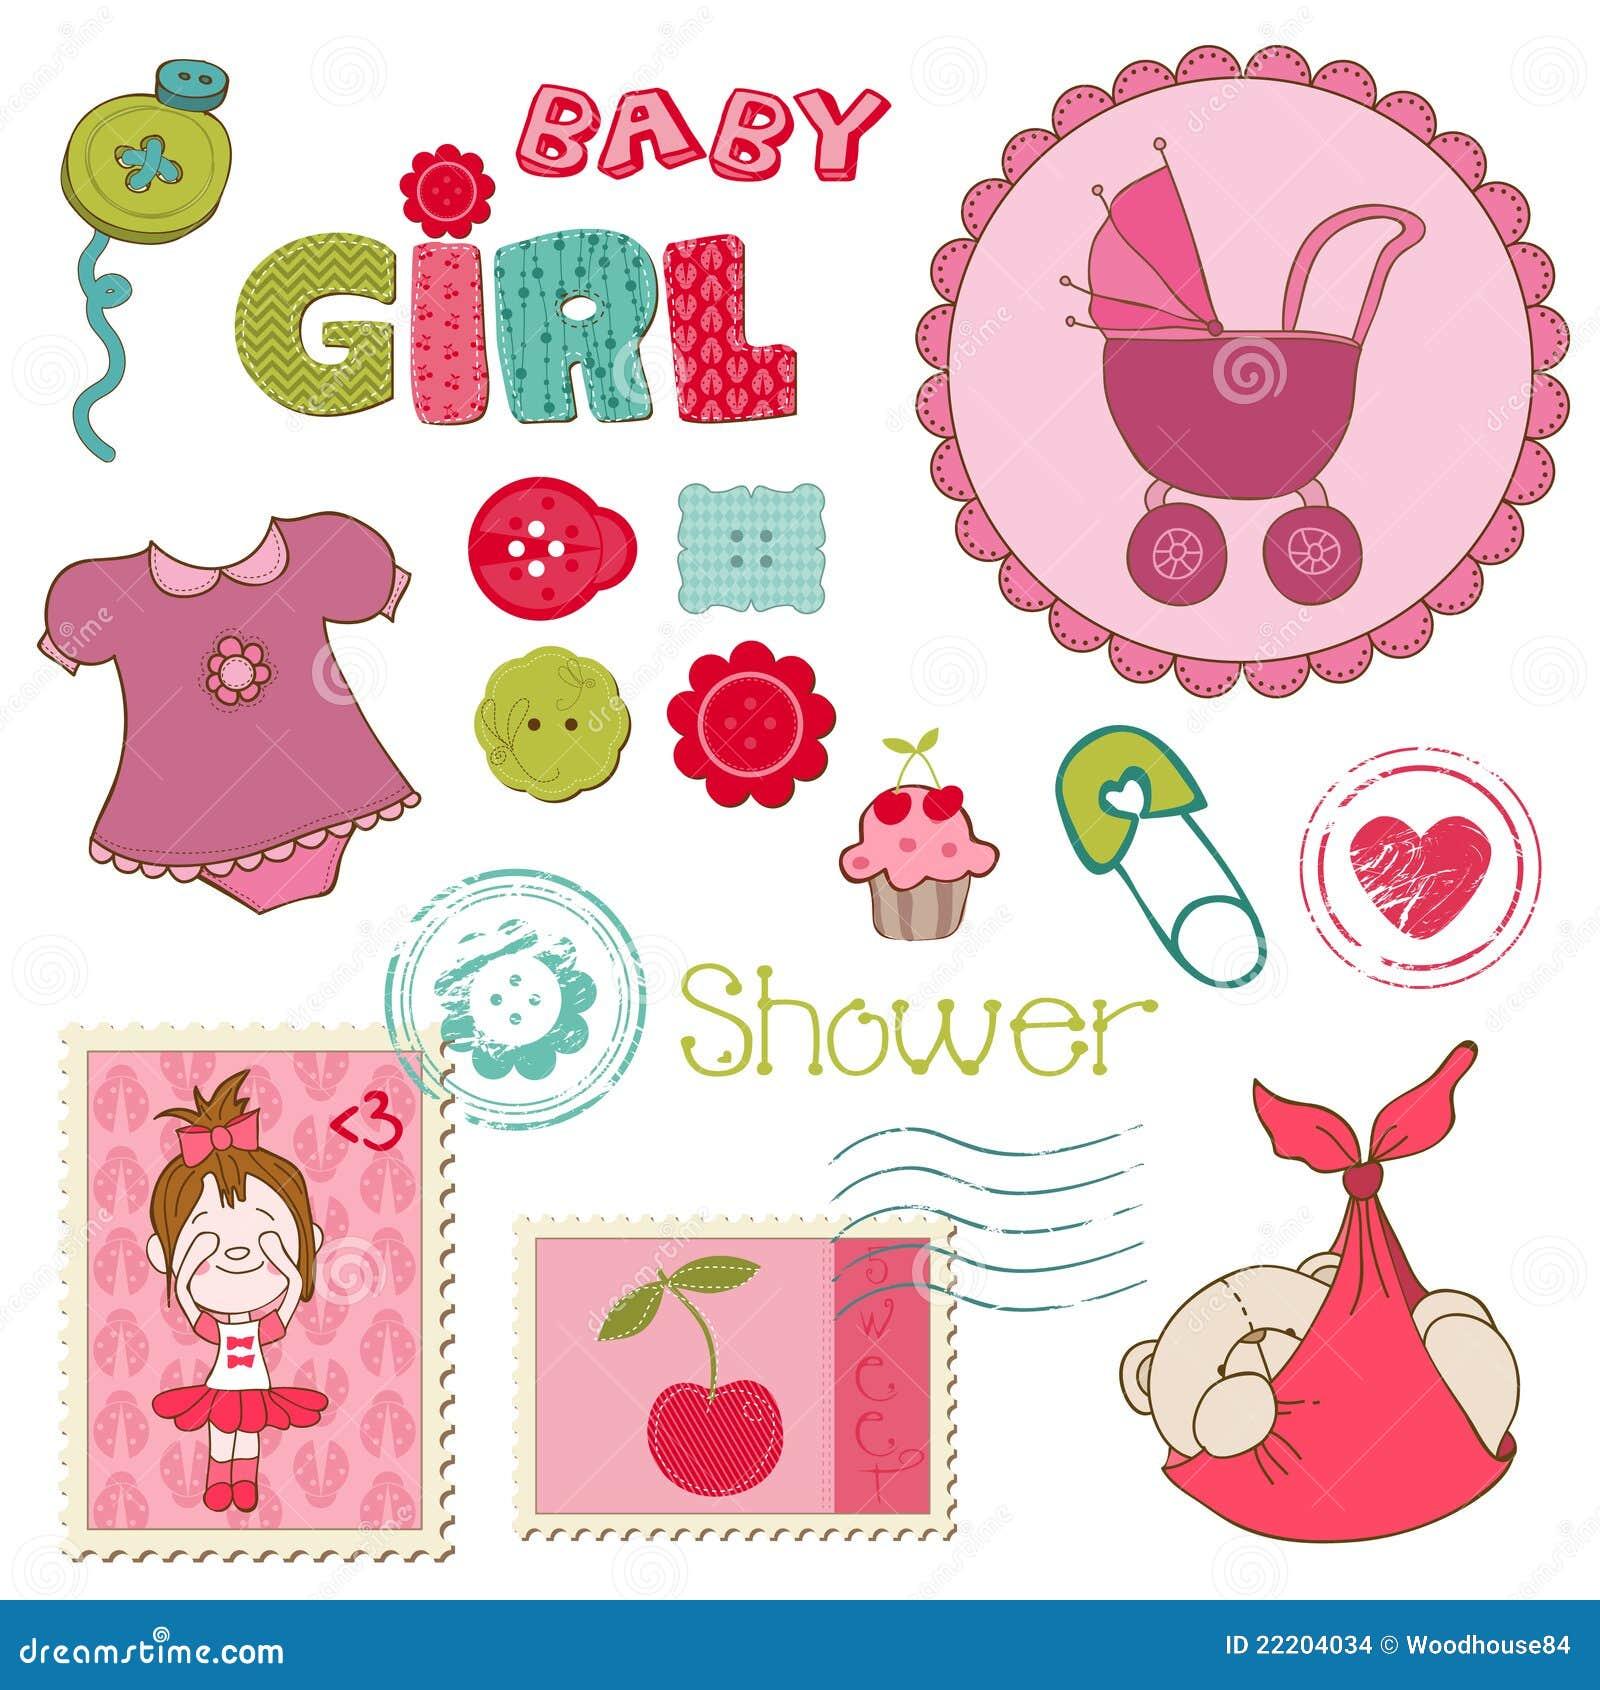 How to scrapbook for baby girl - Scrapbook Baby Shower Girl Set Stock Images